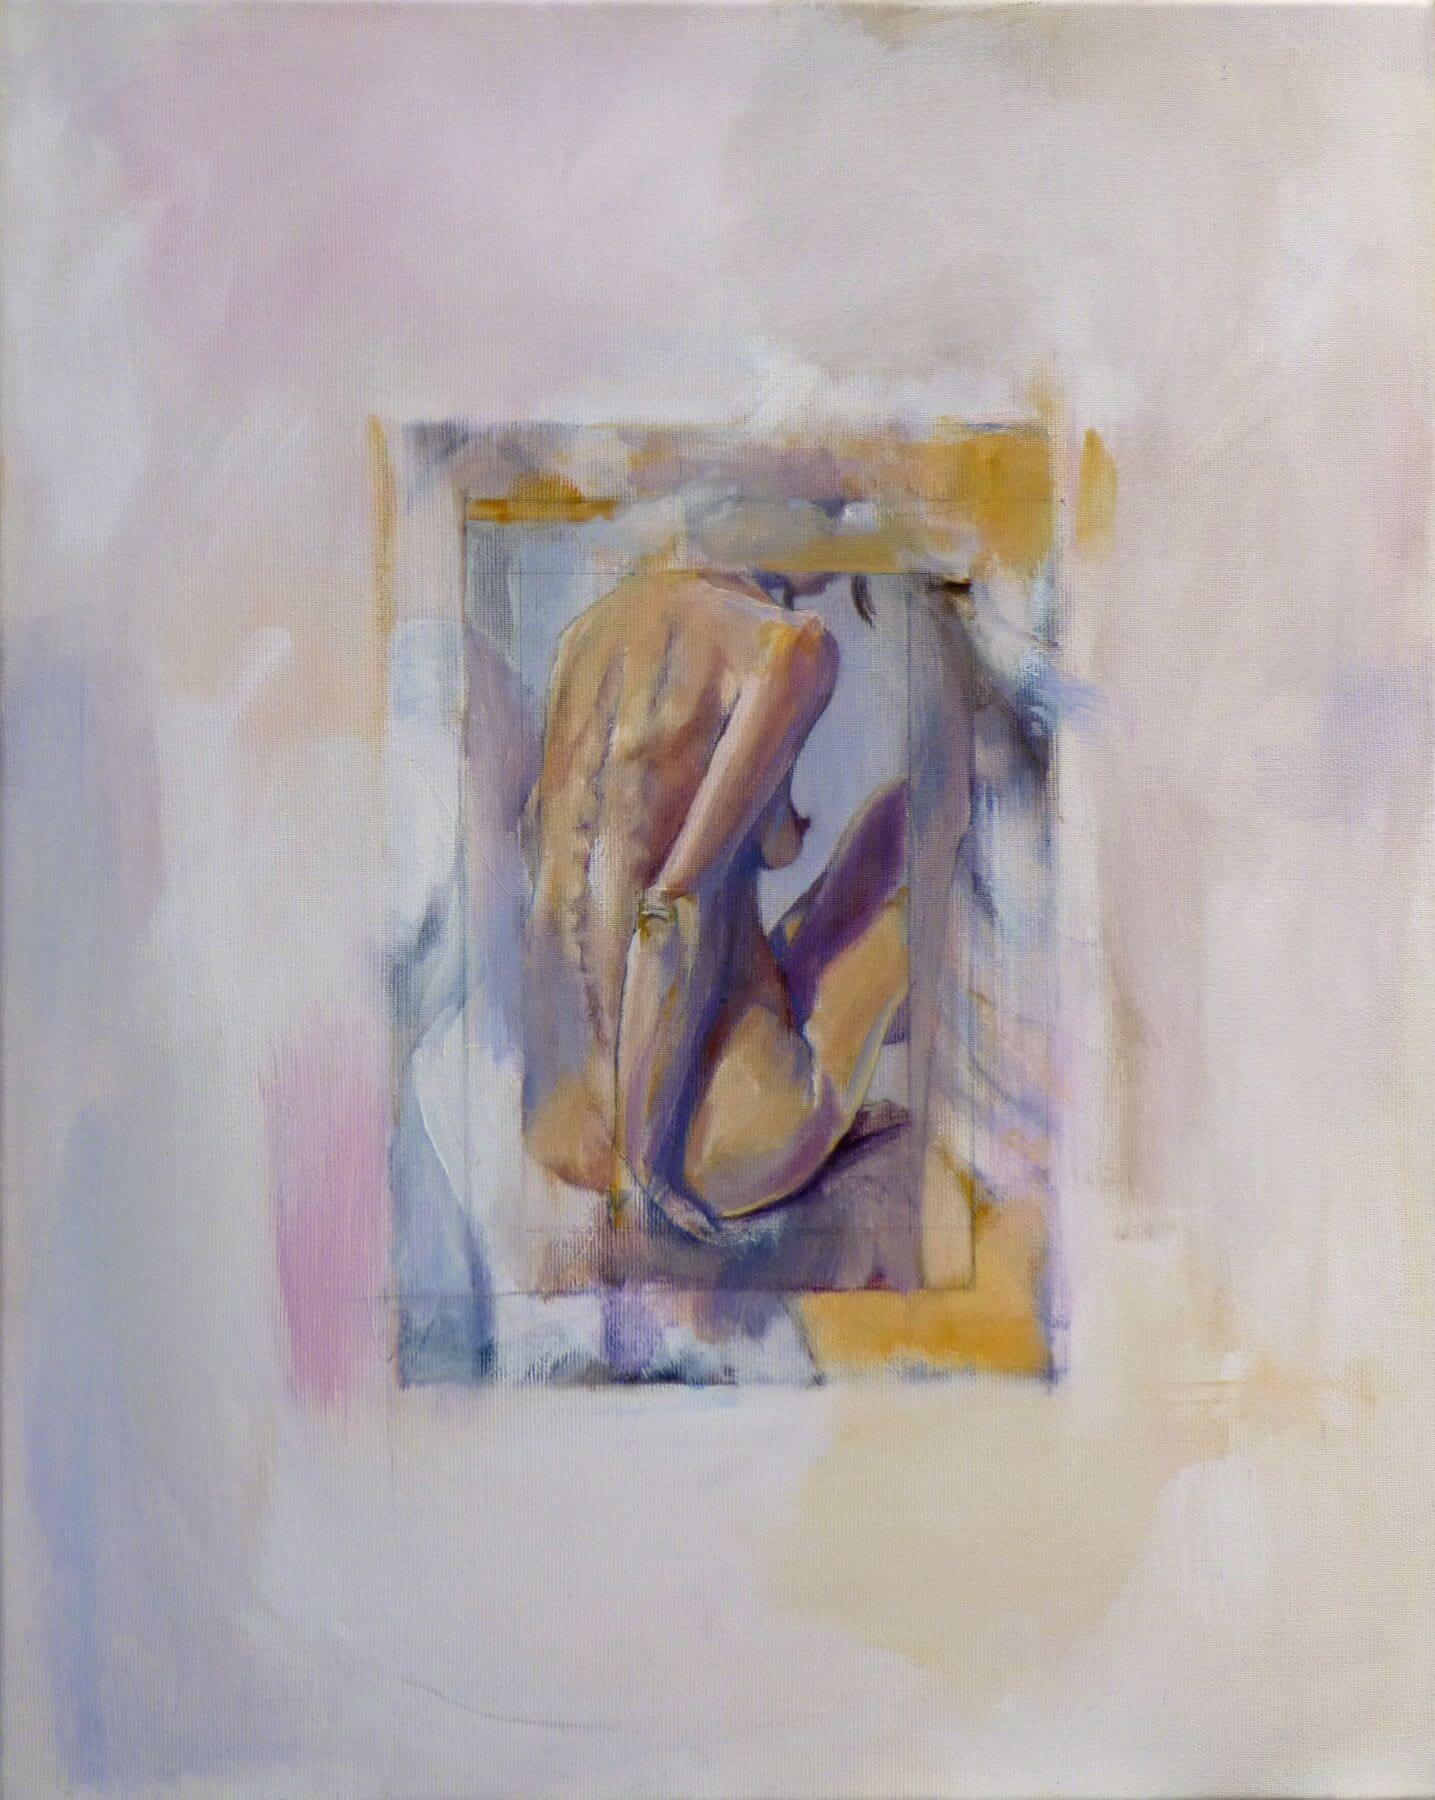 Swan - painting, acrylic on canvas by artist Neva Bergemann